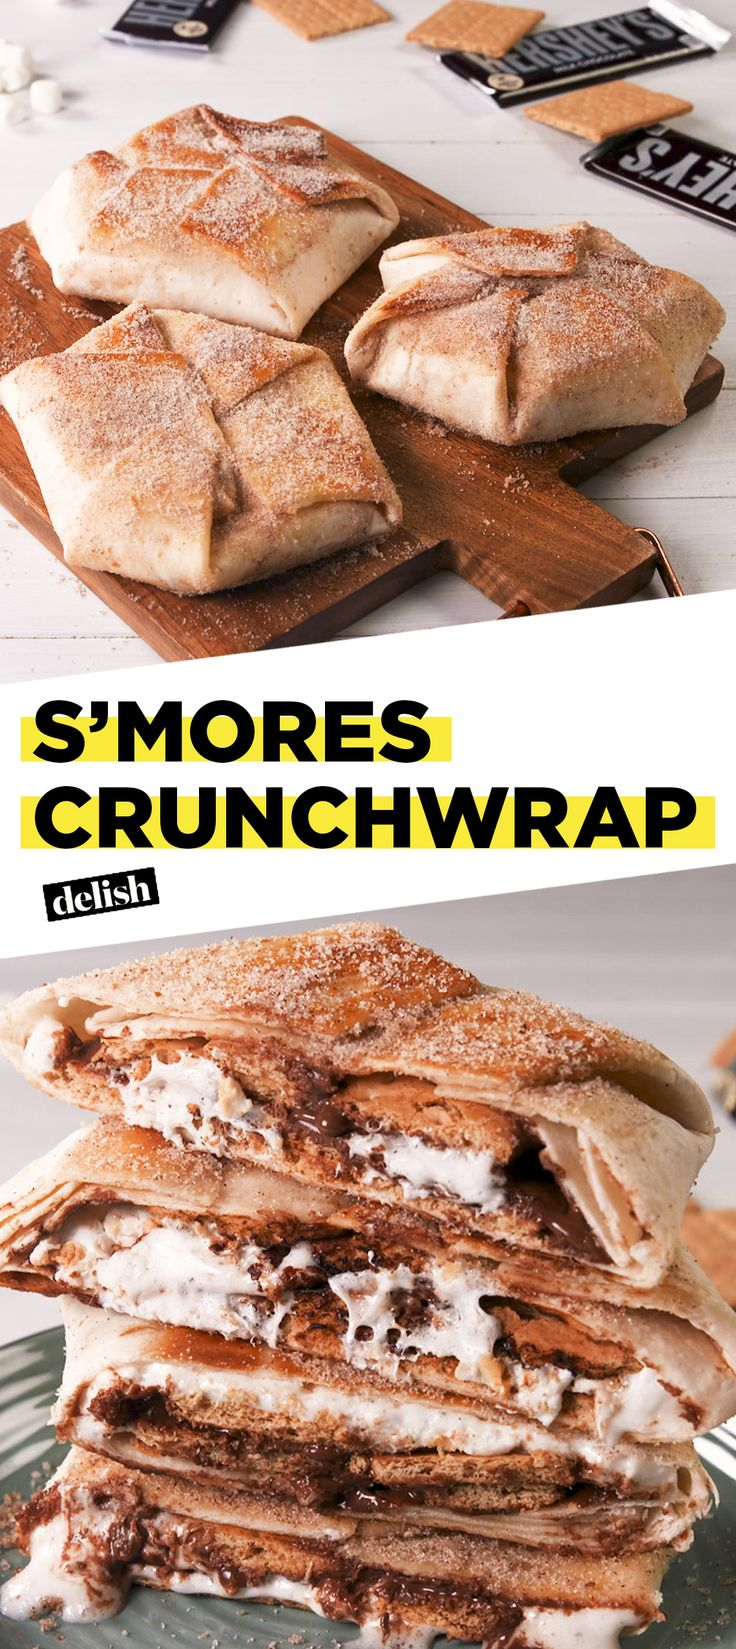 This S'mores Crunchwrap is like nothing you've EVER seen. Get the recipe at Delish.com. #recipe #easy #easyrecipe #smores #chocolate #dessert #dessertrecipe #tacobell #crunchwrap #copycat